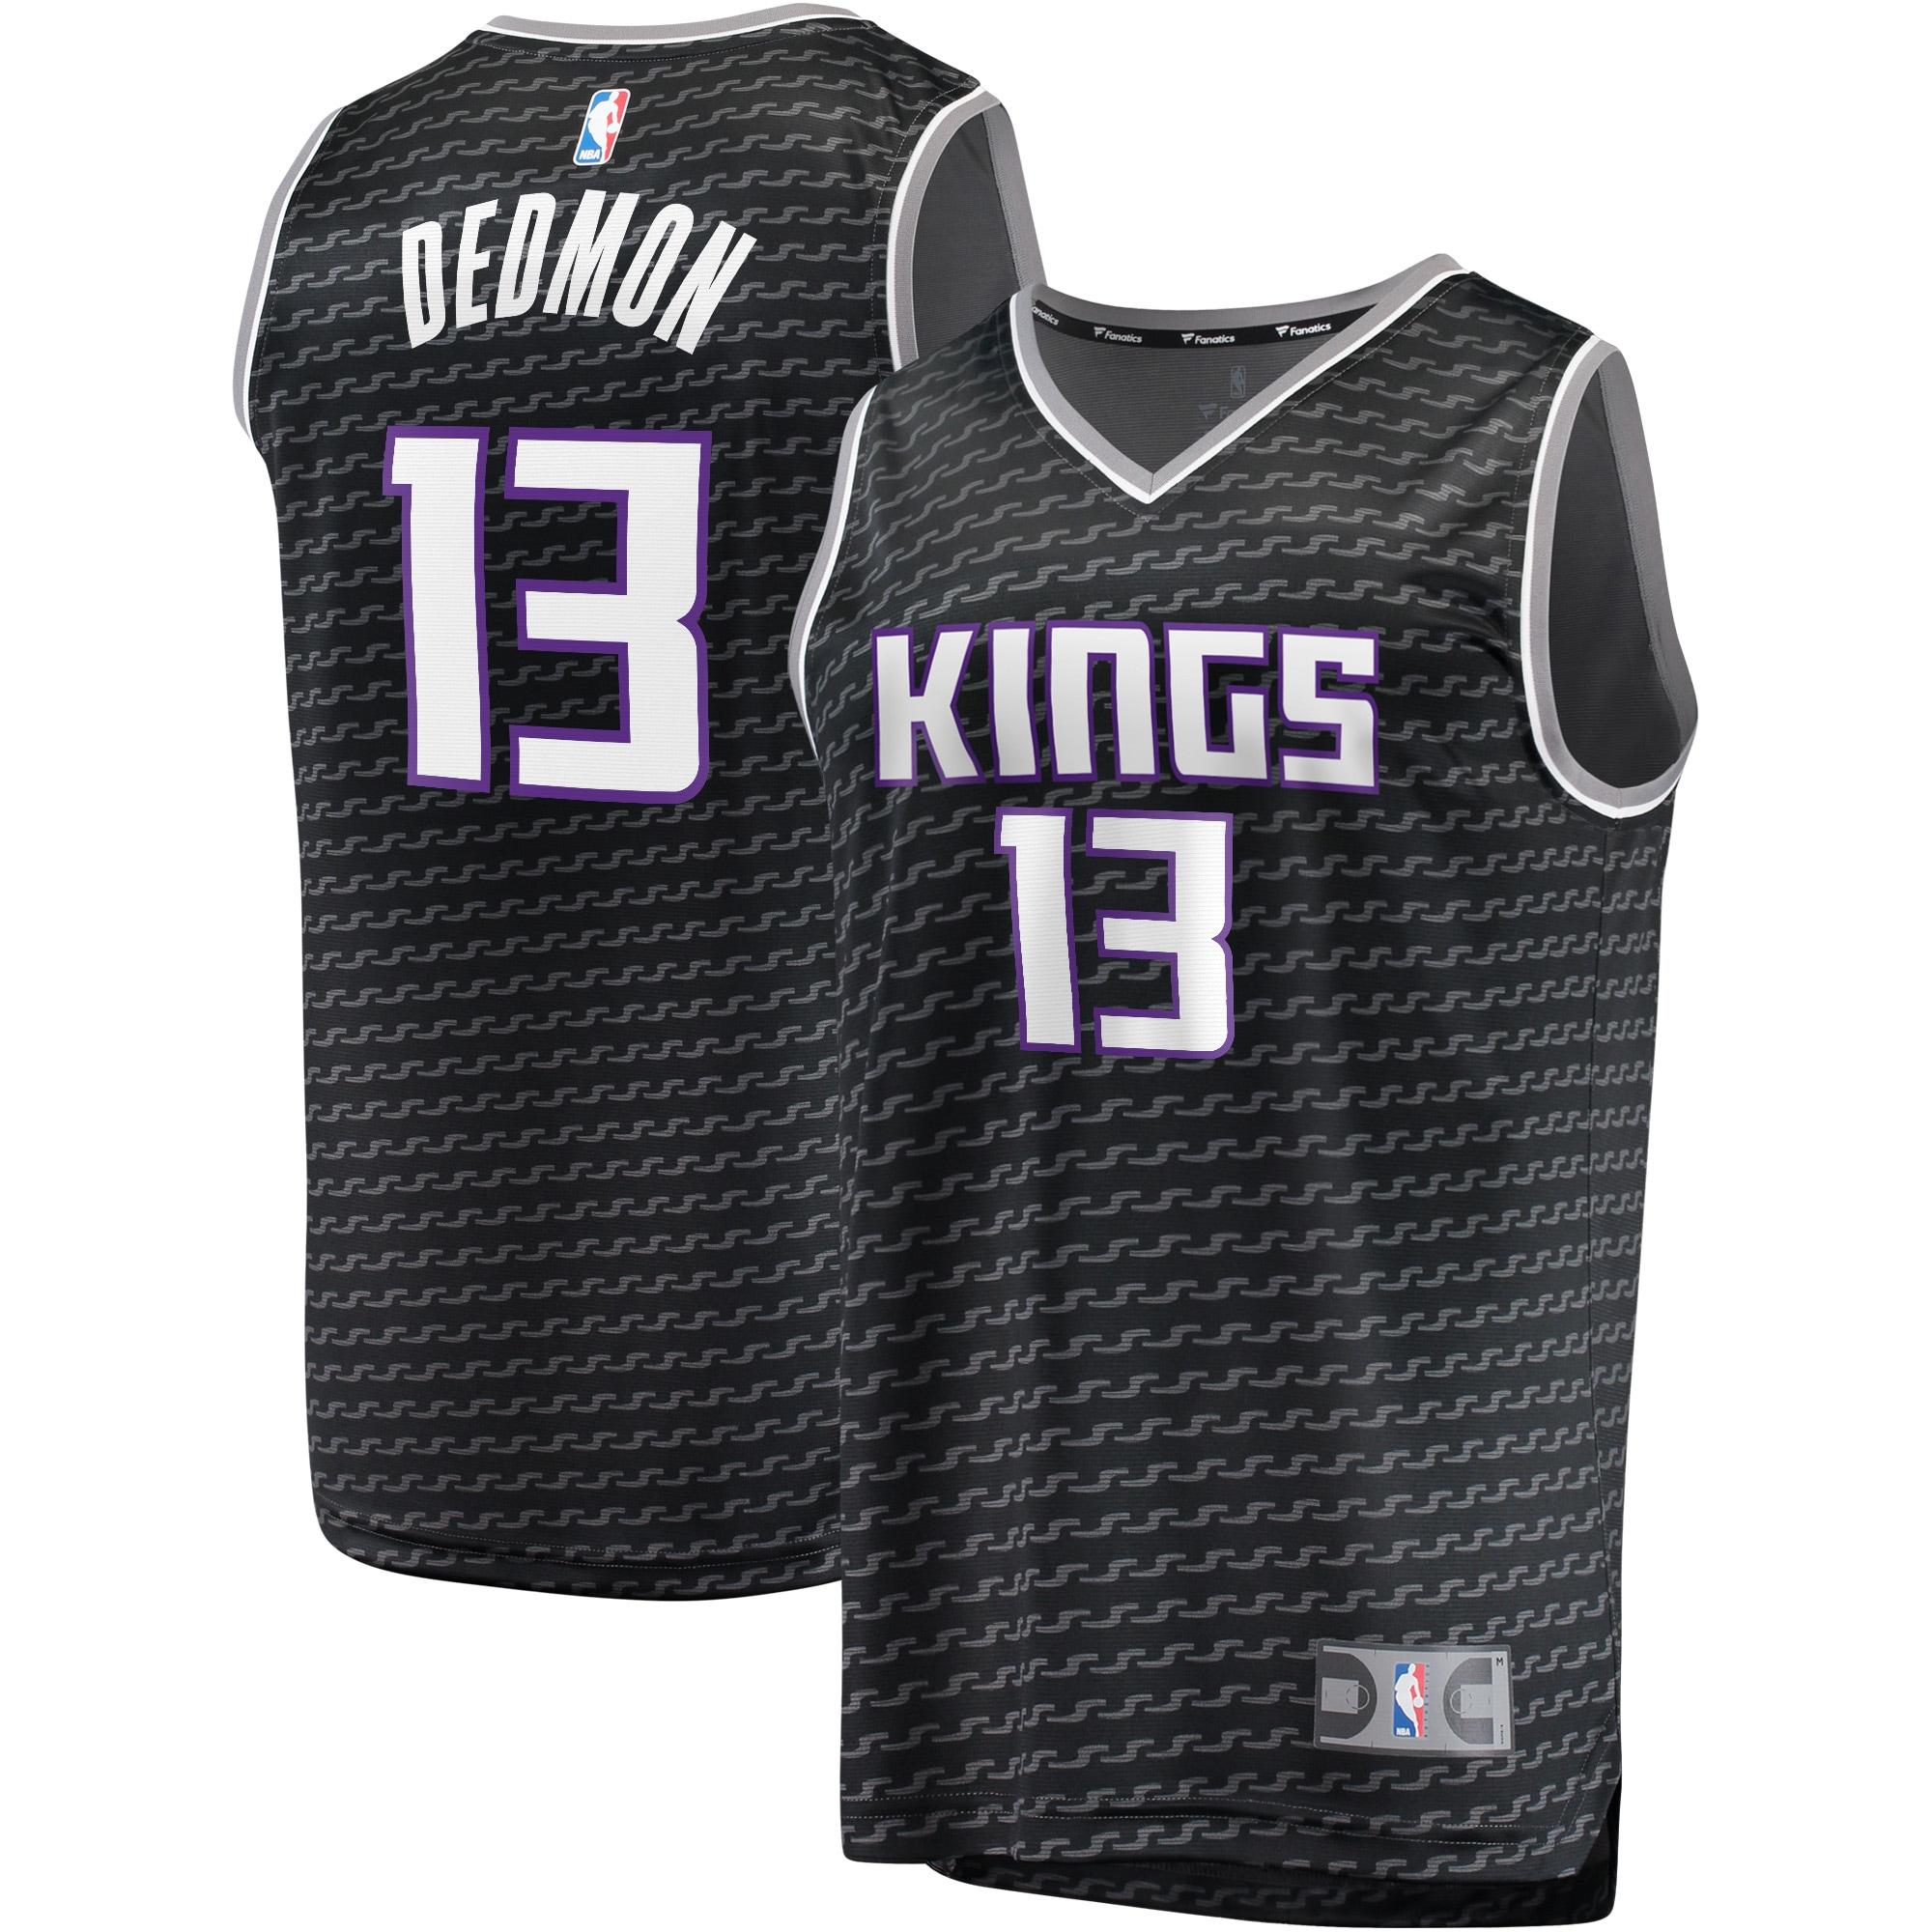 Dewayne Dedmon Sacramento Kings Fanatics Branded Fast Break Replica Player Jersey Black - Statement Edition